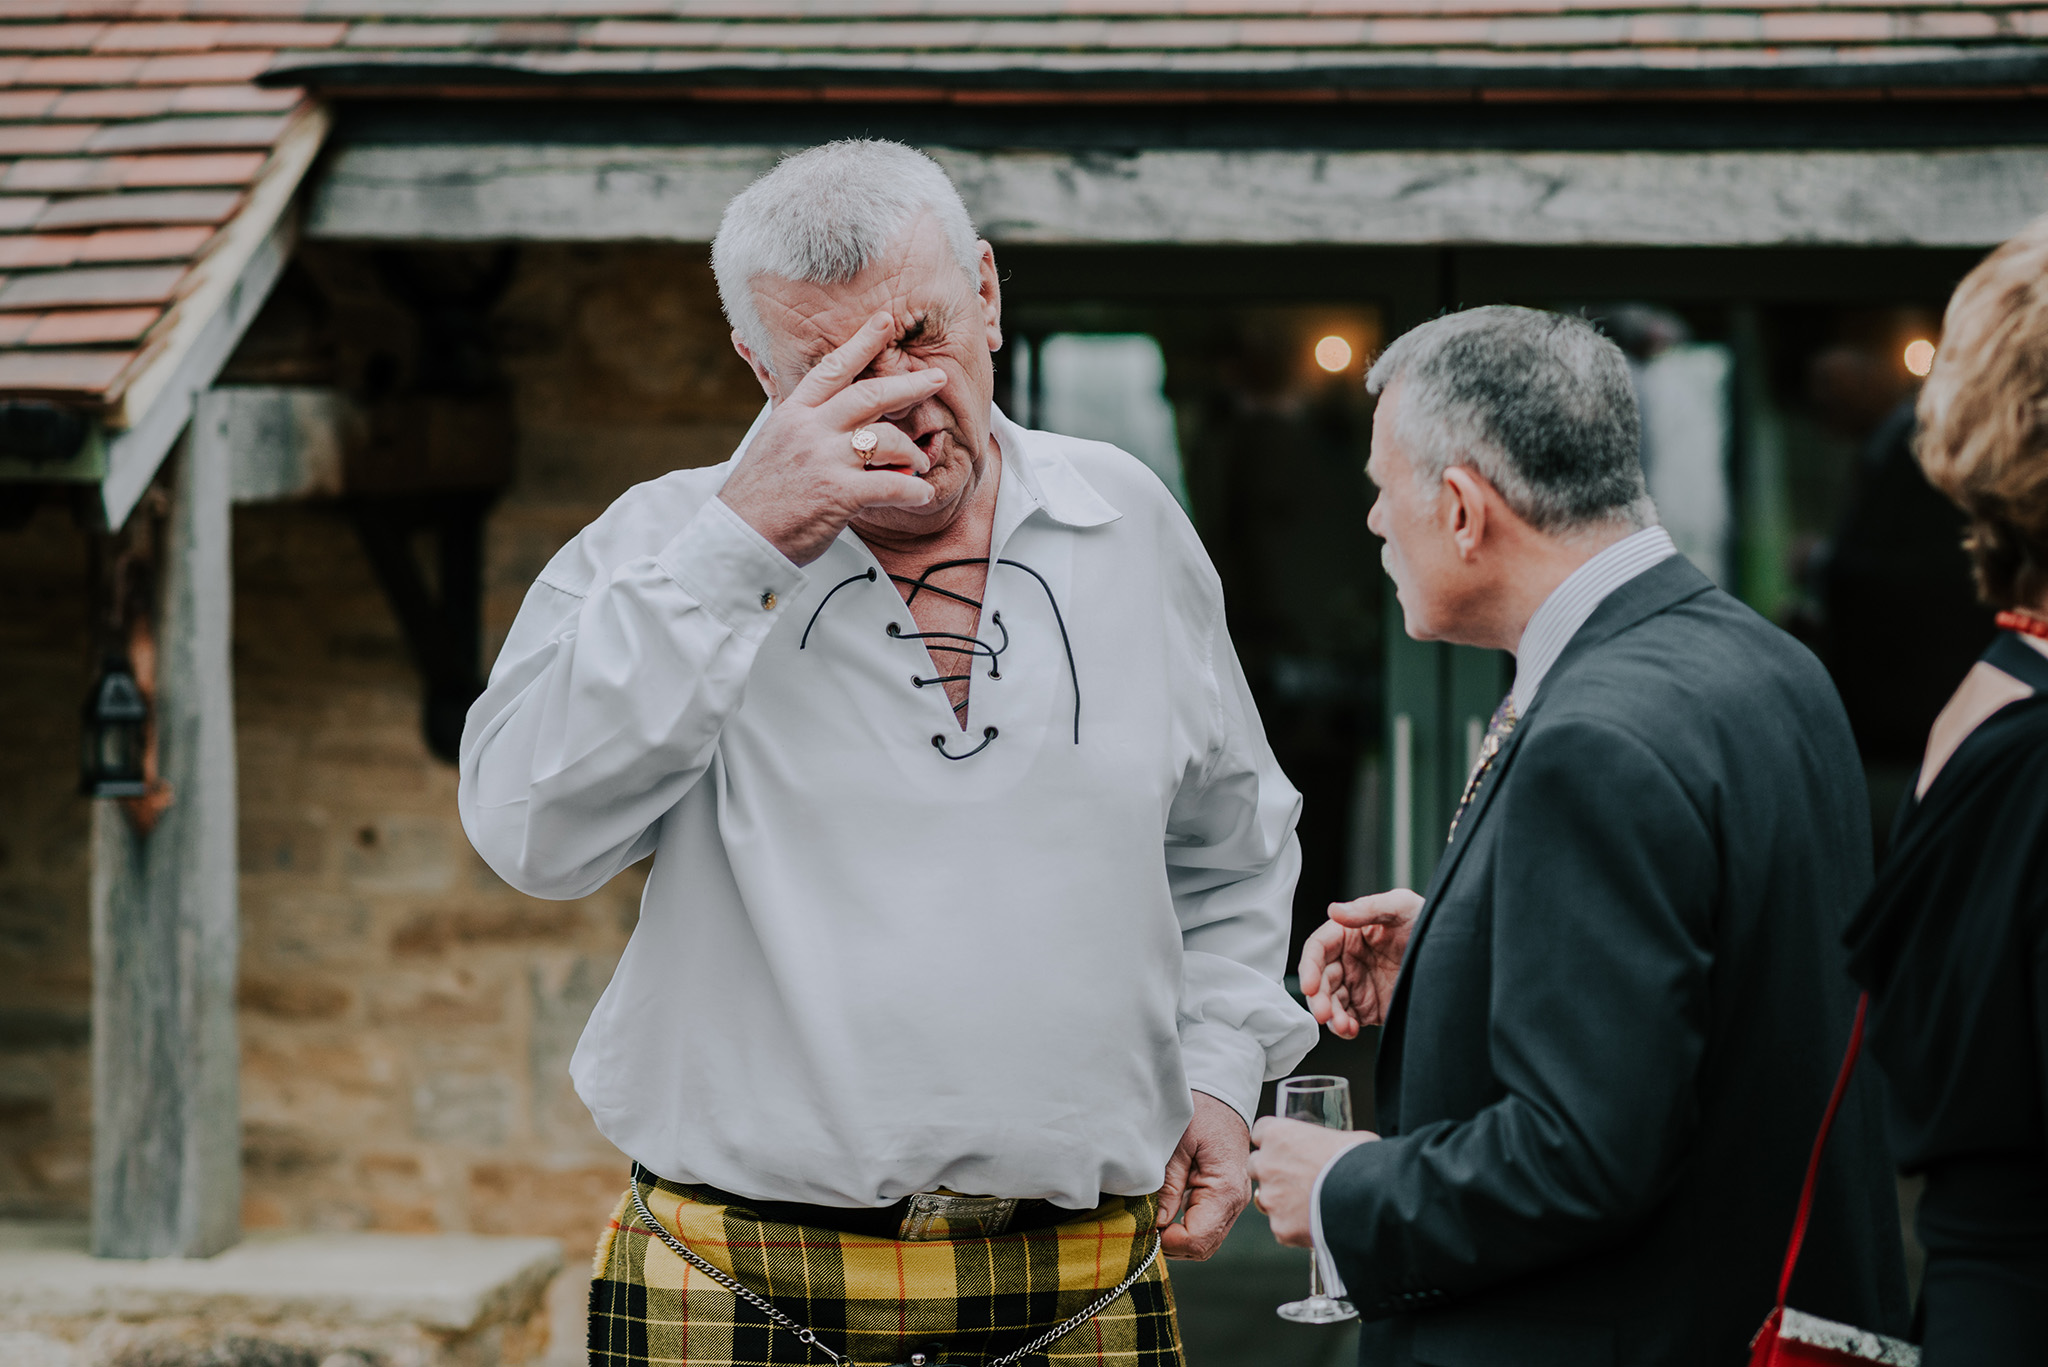 scott-stockwell-photography-wedding-17.jpg